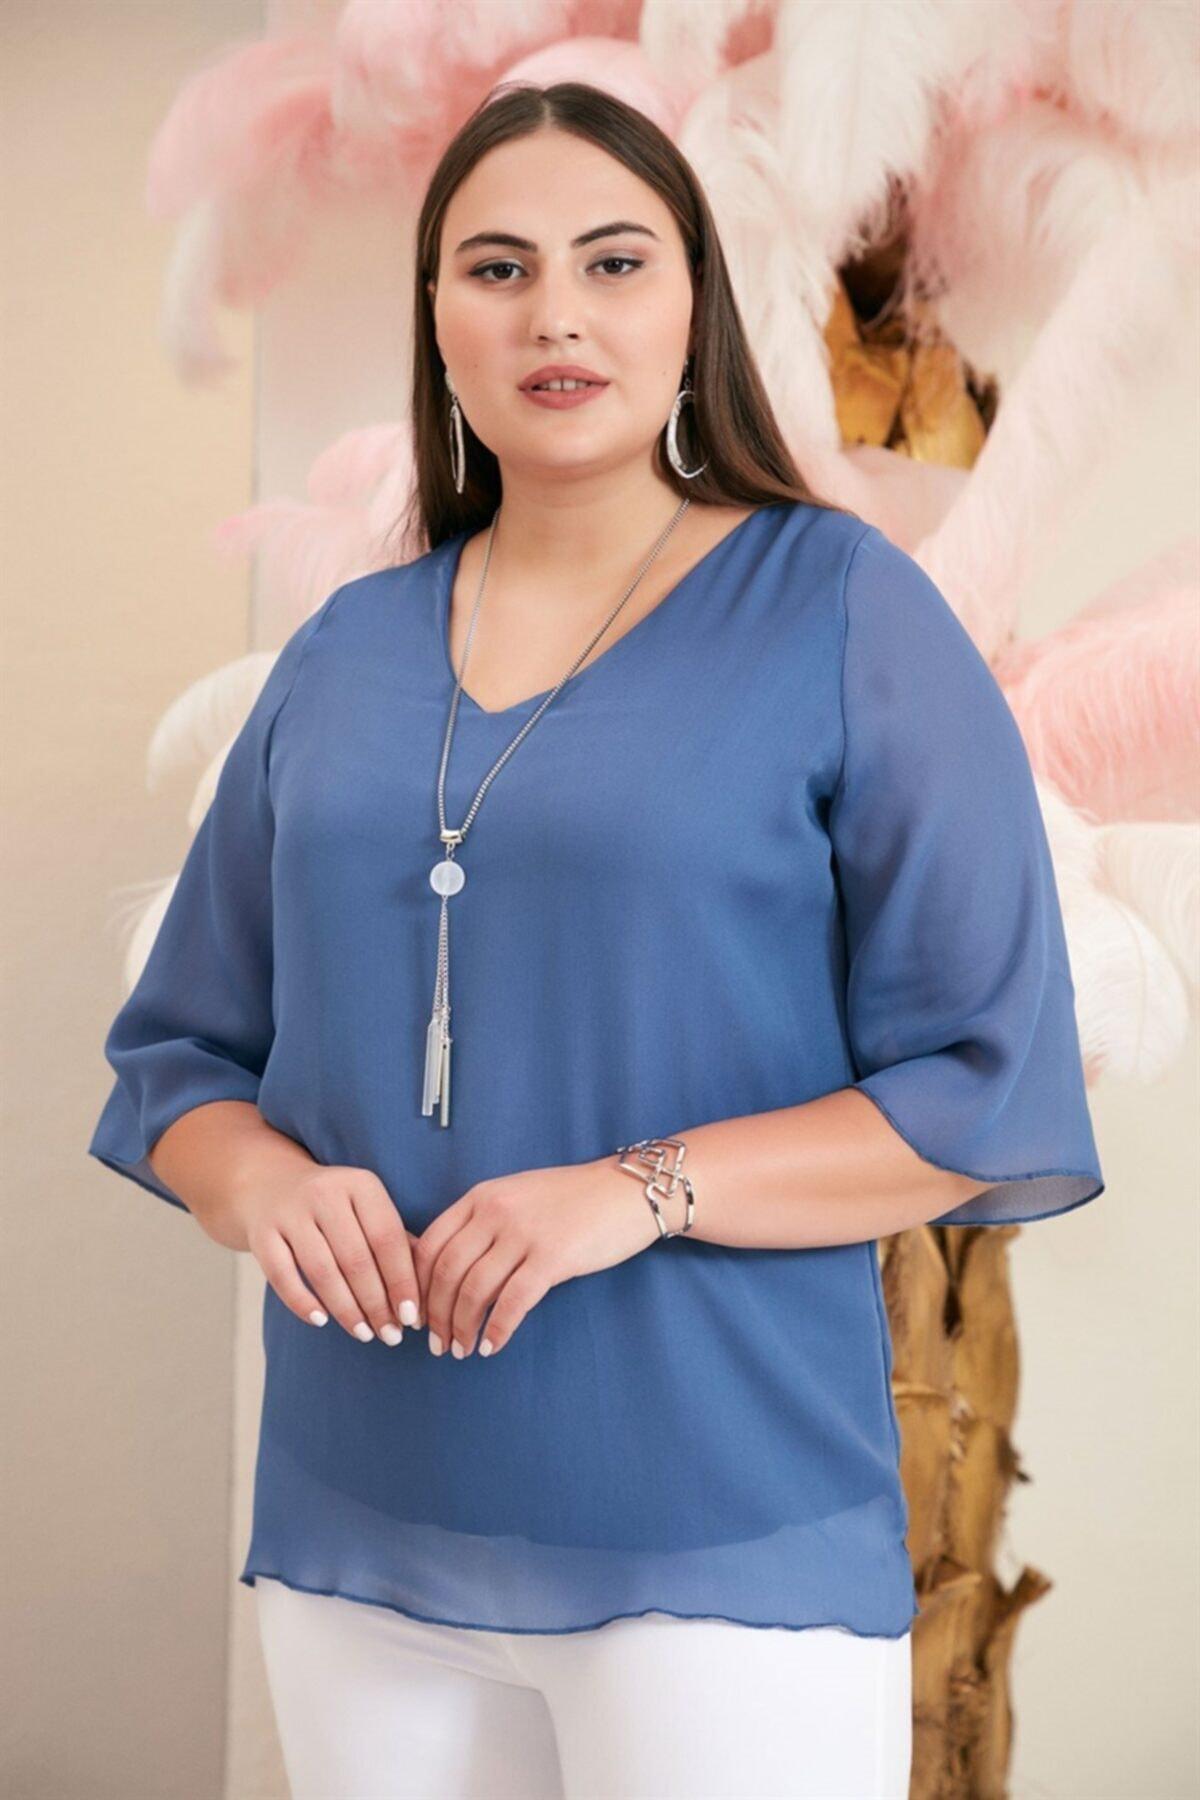 RMG Kol Detaylı Aksesuarlı V Yaka Büyük Beden Indigo Bluz 2